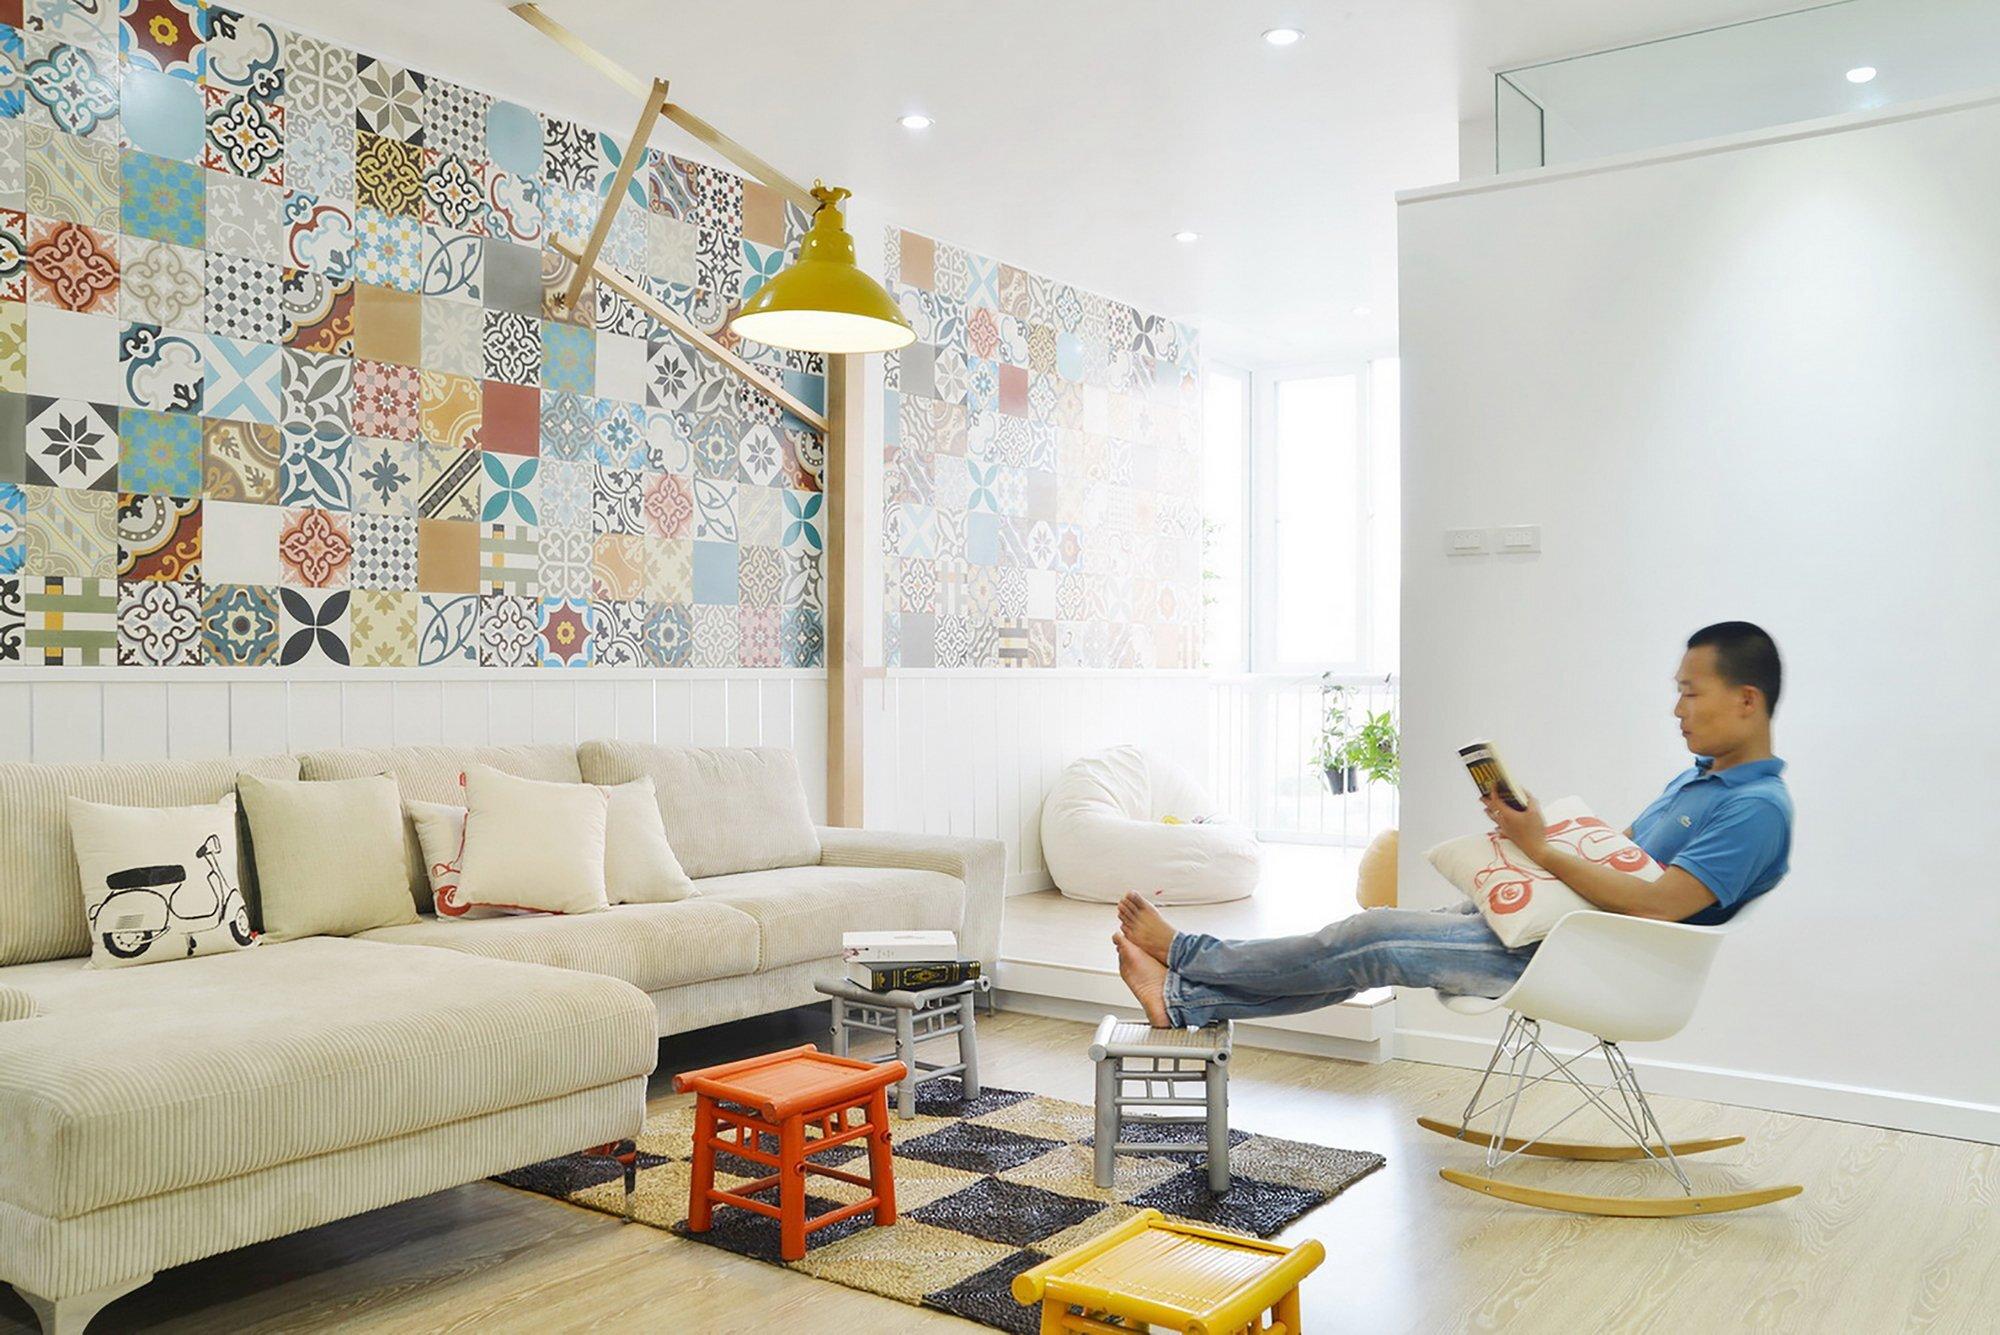 HT Apartment - Landmak Architect - Hanoi - Vietnam - Small Apartment - Living Room 2 - Humble Homes